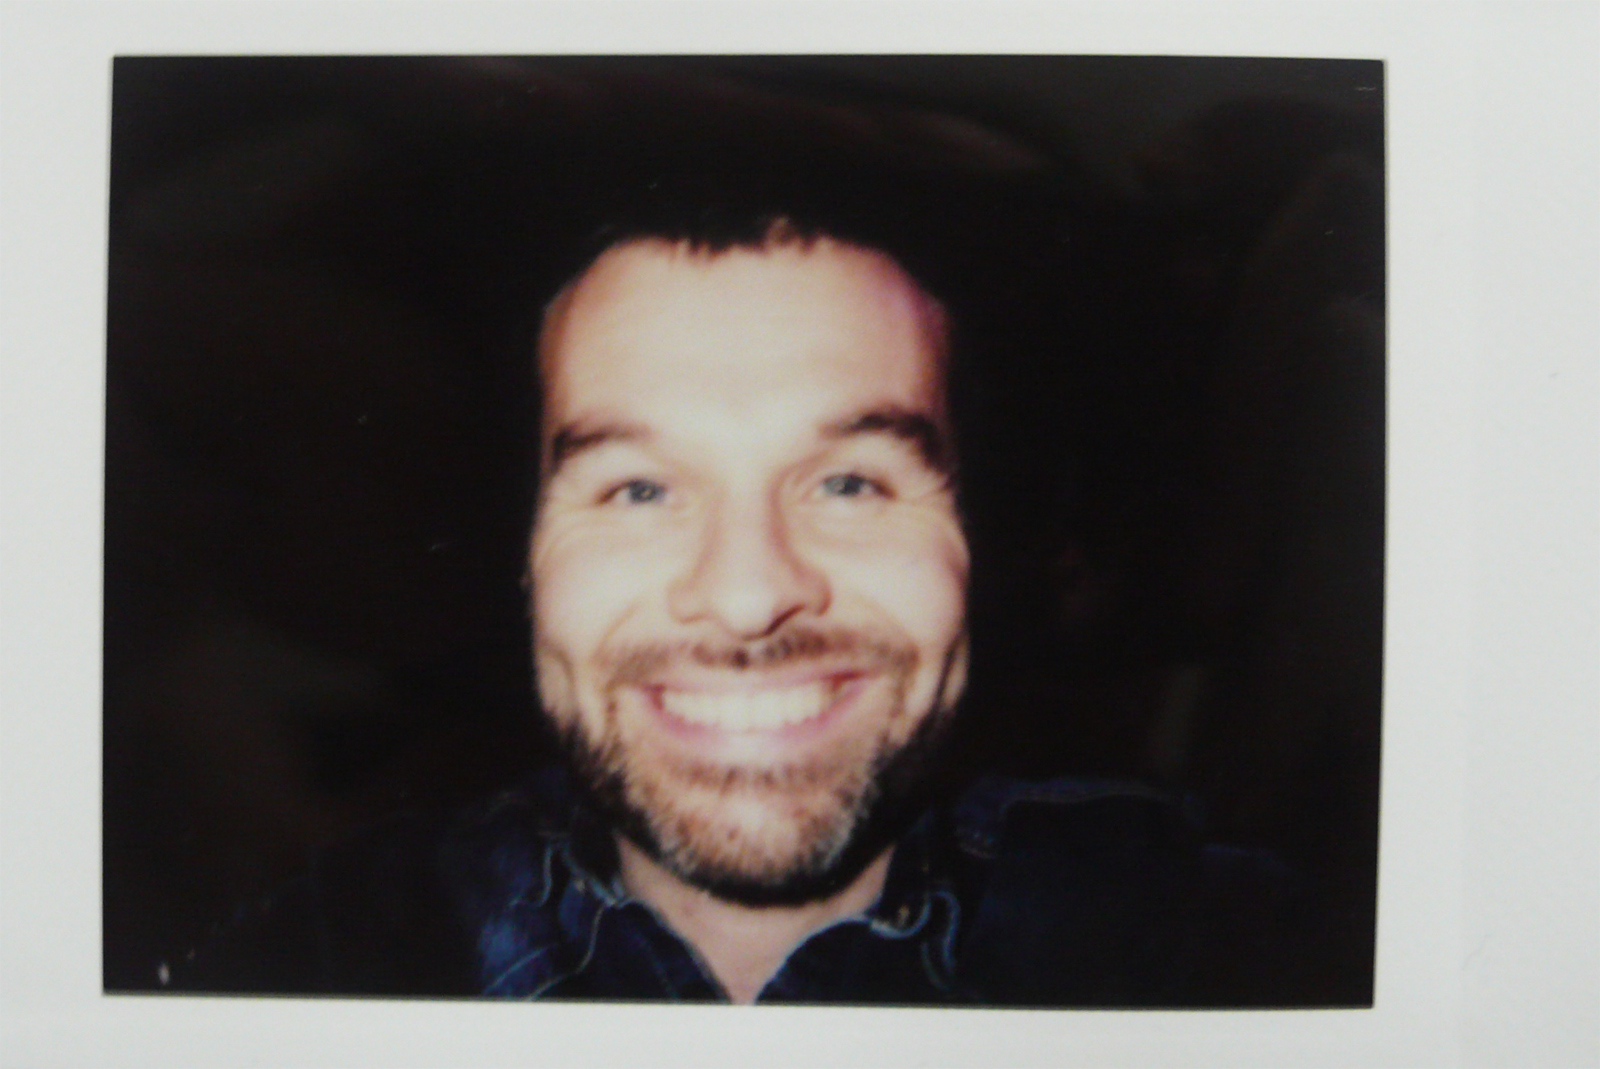 Selfie polaroid exclu de Ladislas Chollat pour #UsofParis